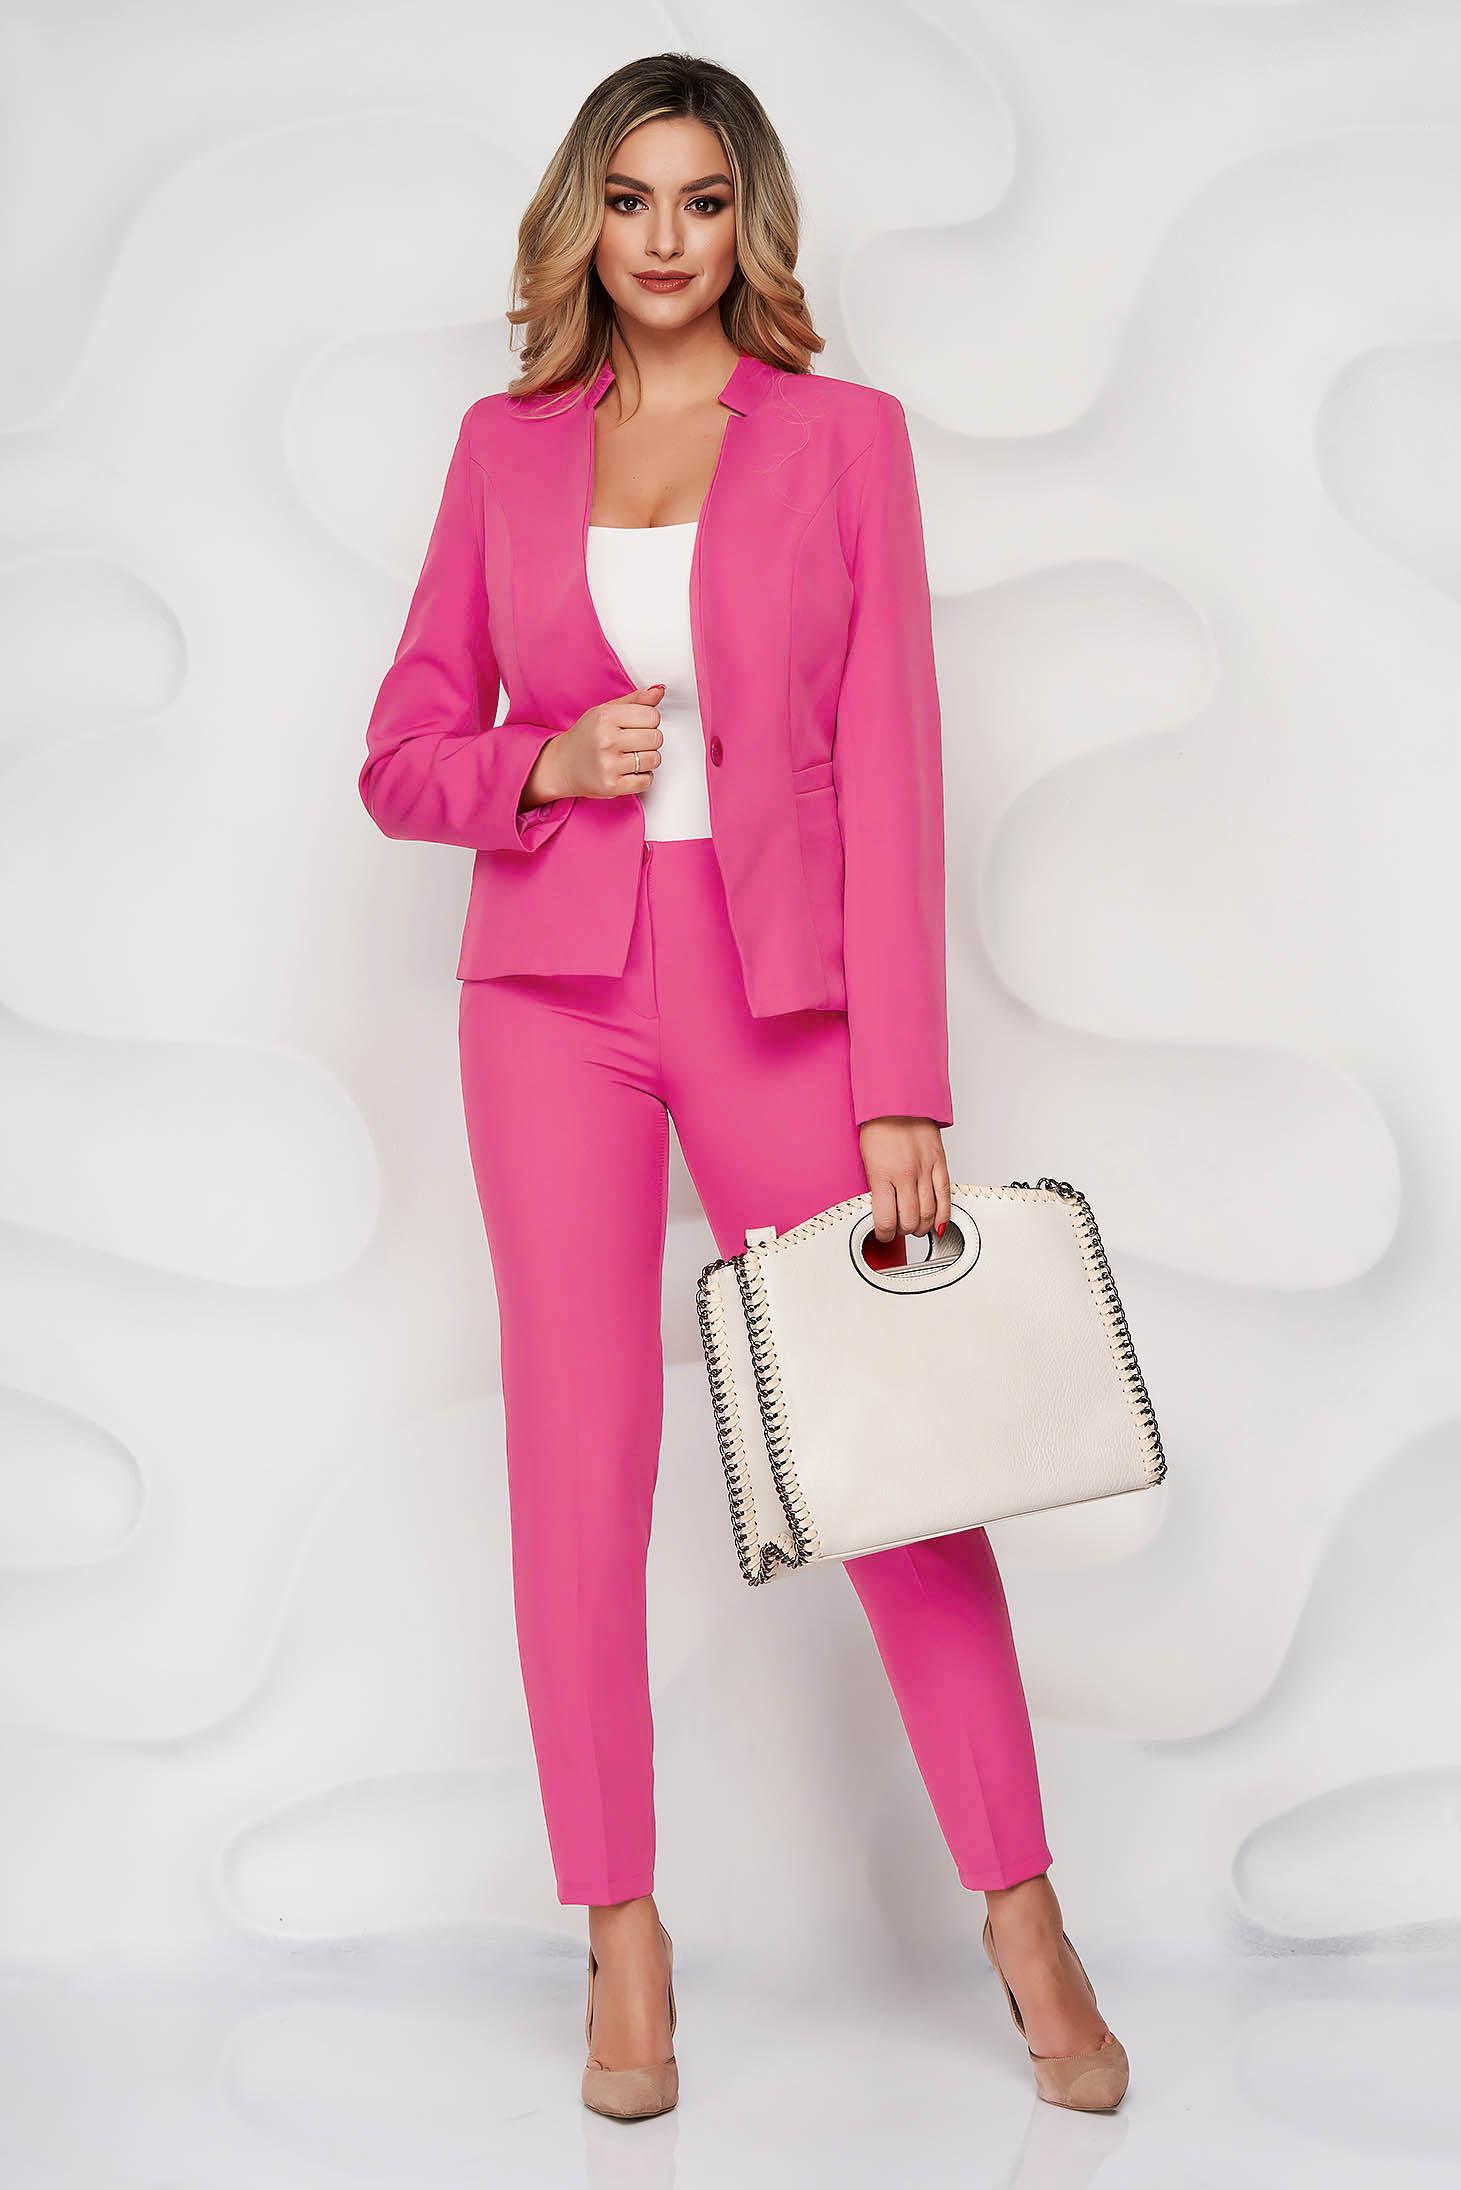 Pink irodai szett rugalmatlan anyag